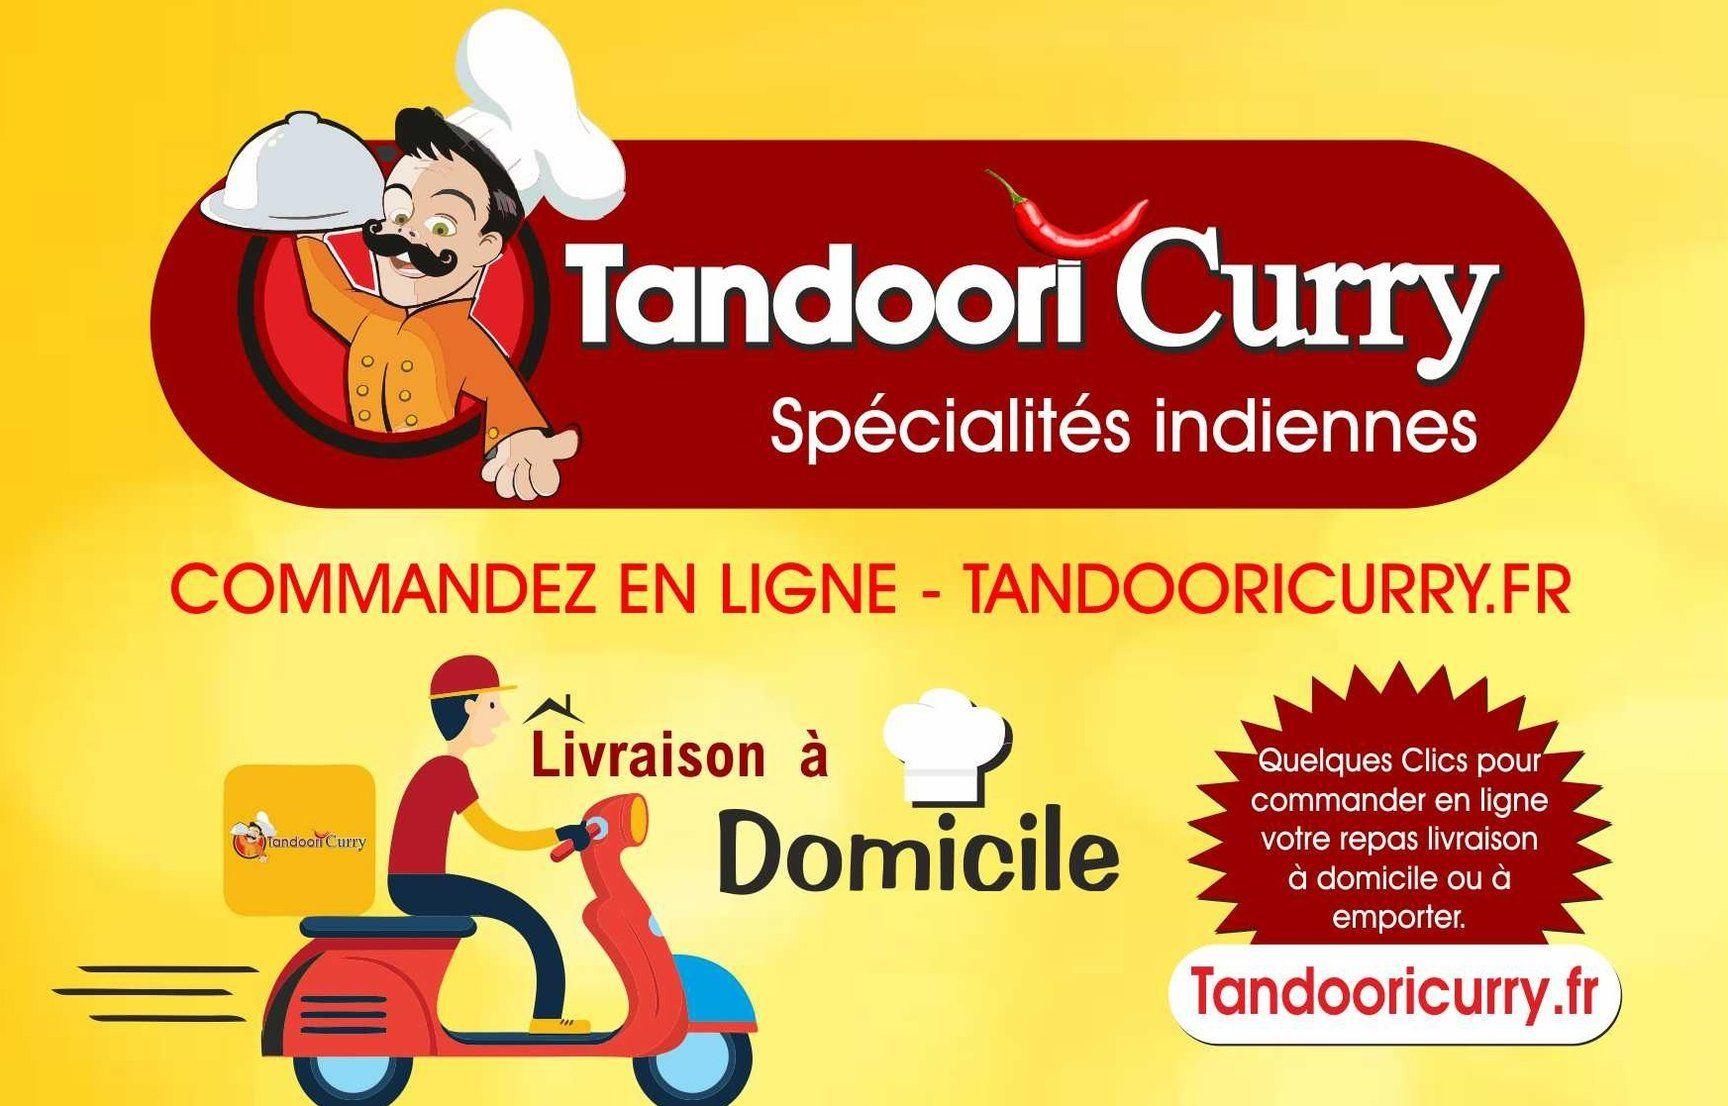 Tandoori Curry Restaurant Indien, Livraison de Repas Emporter, Sur